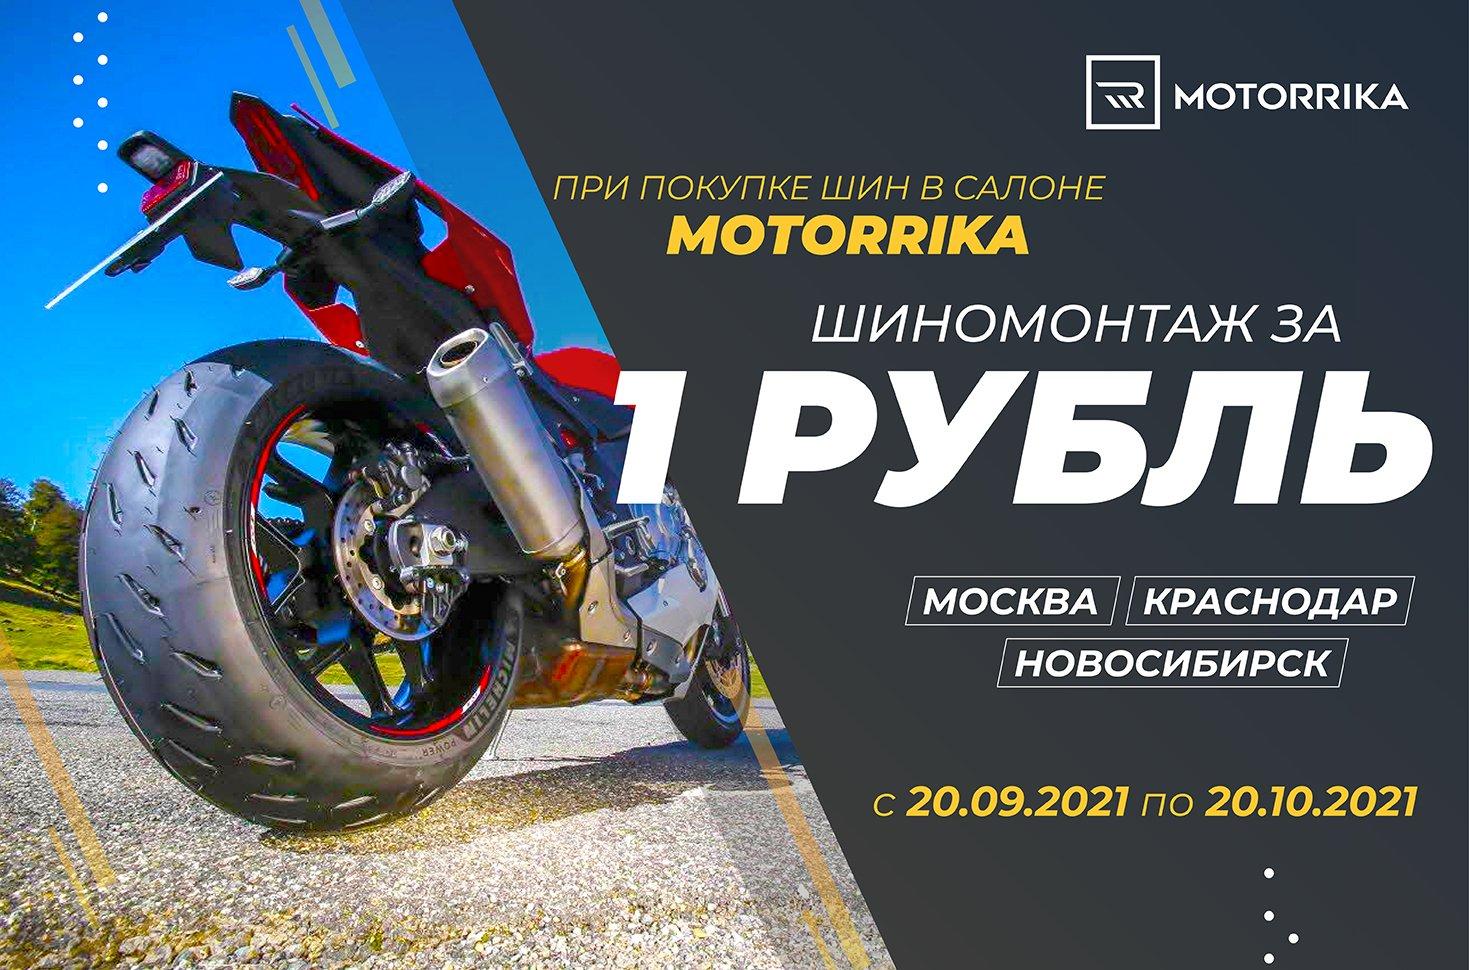 news motorrika